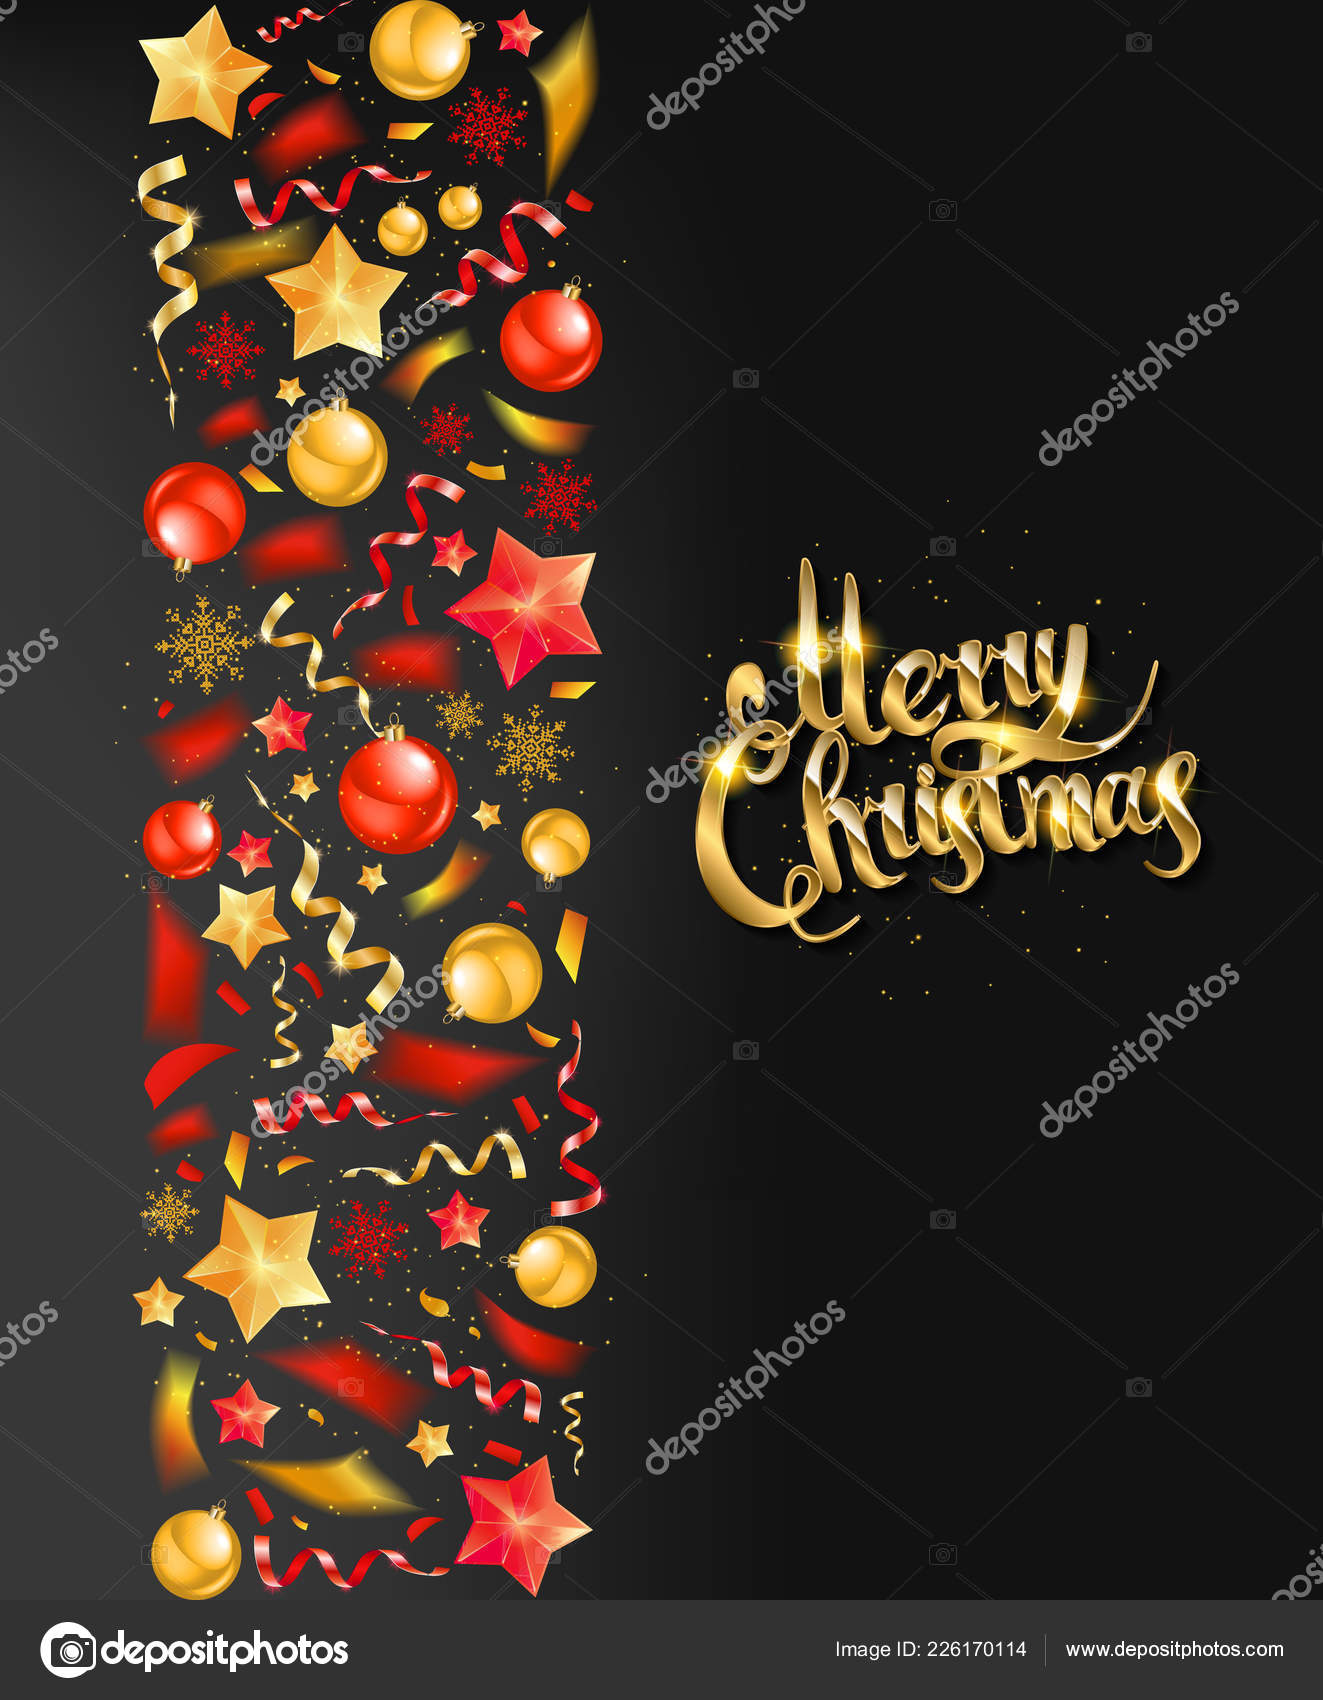 Invitación Fiesta Cena Navidad Cartel Folleto Tarjeta